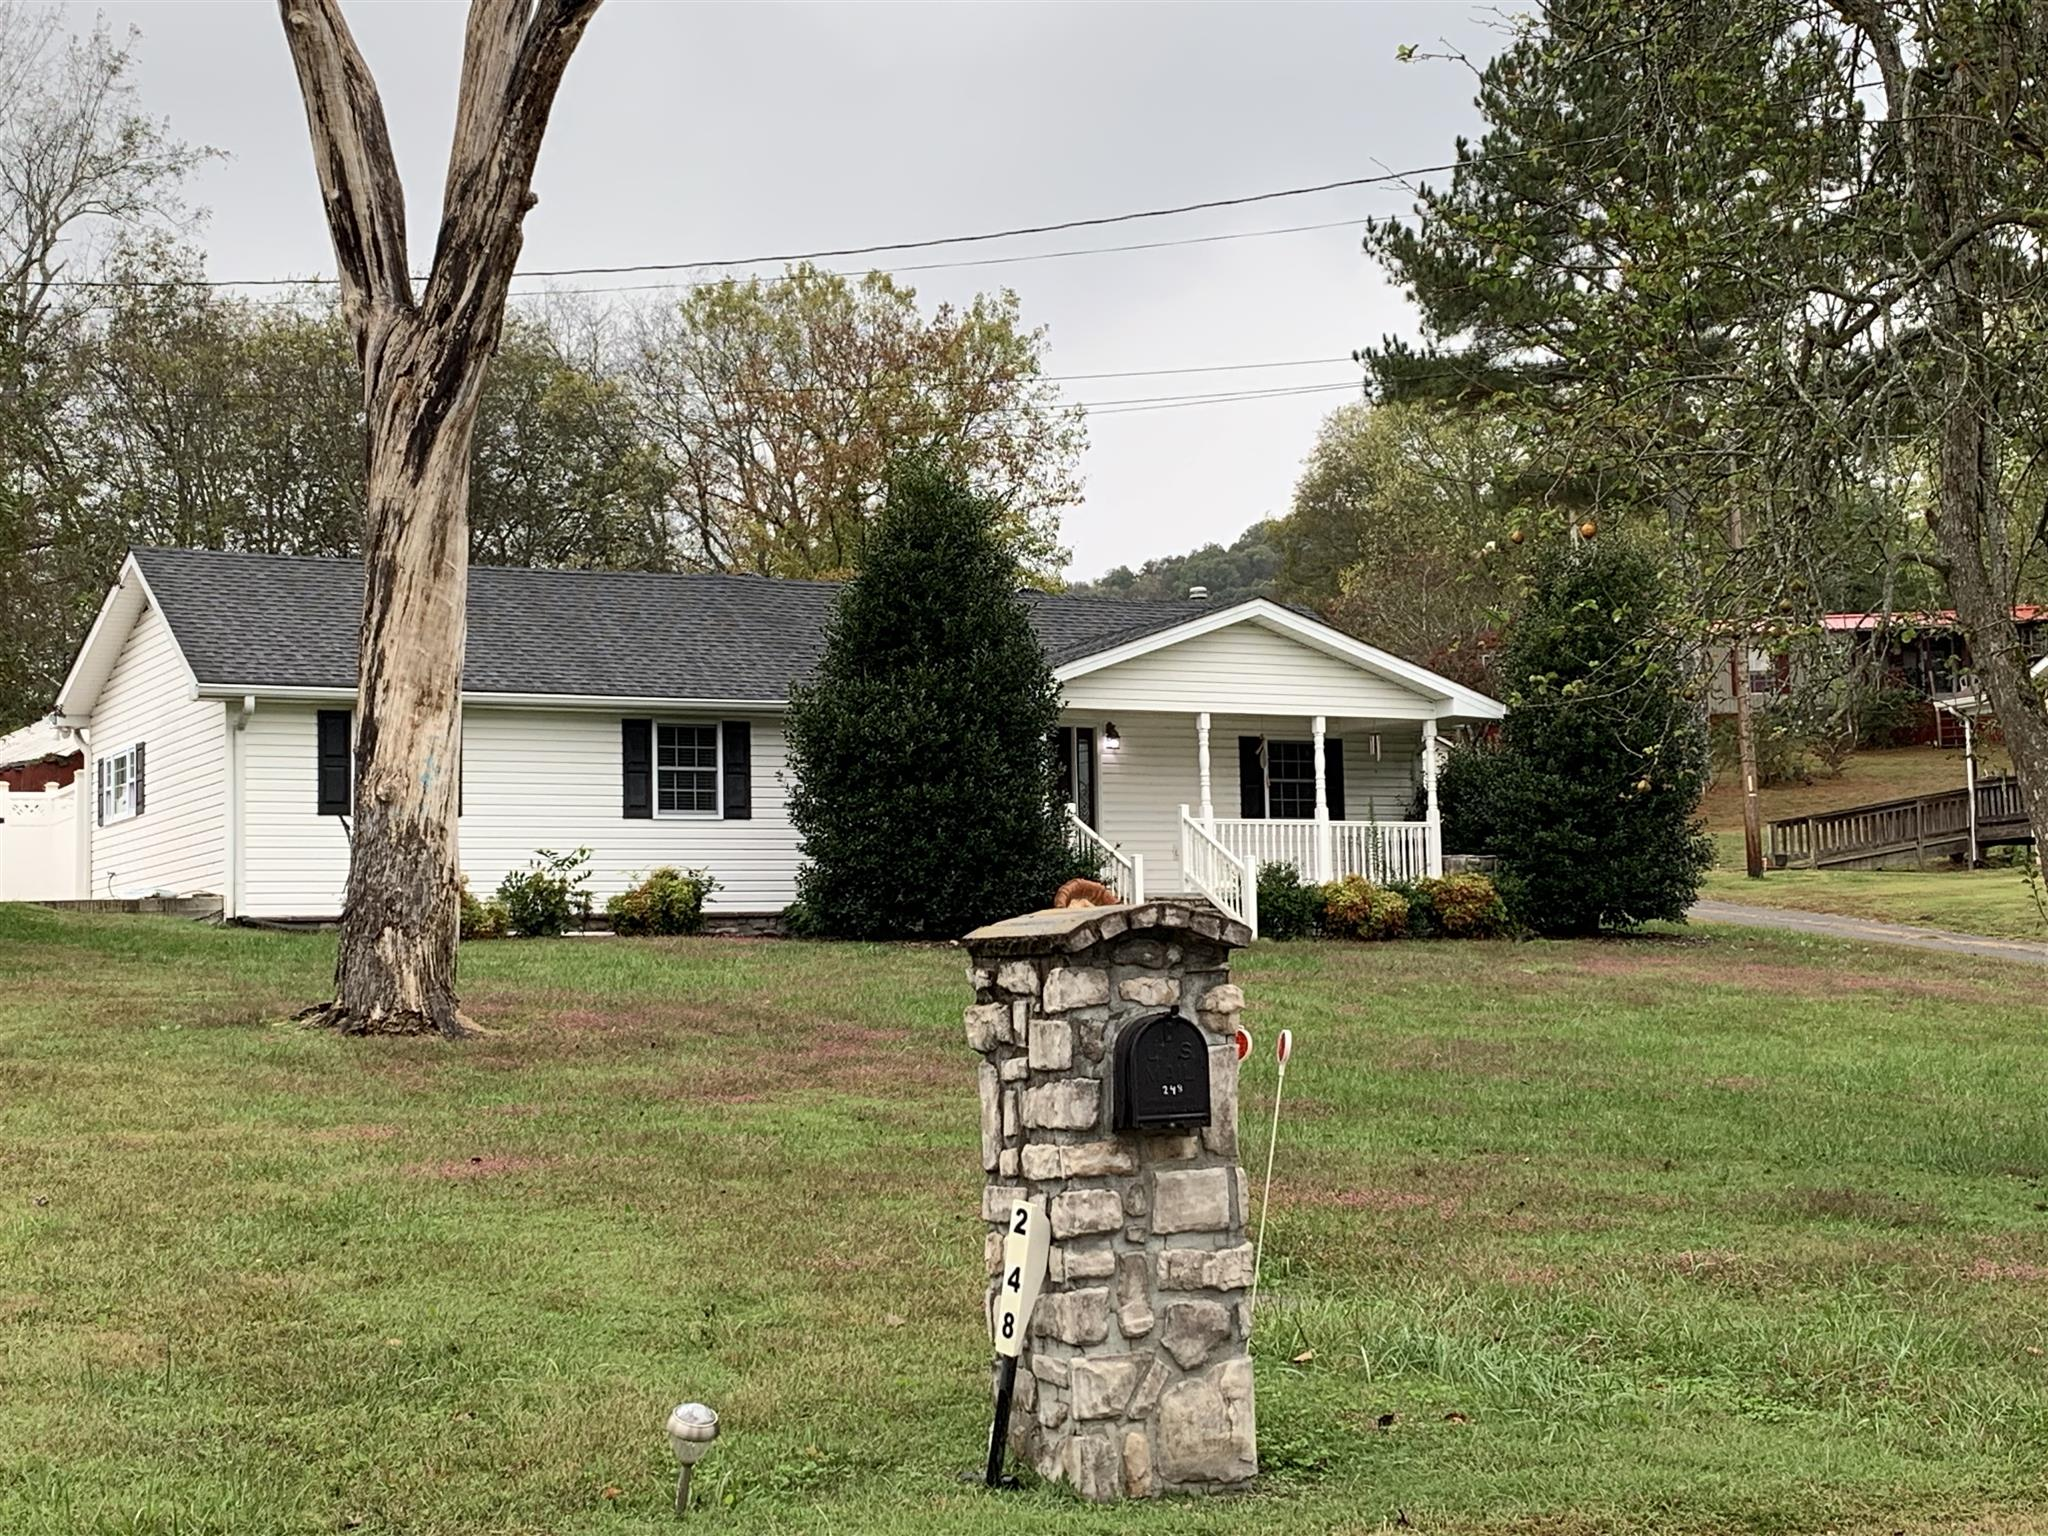 248 S Main St, Carthage, TN 37030 - Carthage, TN real estate listing